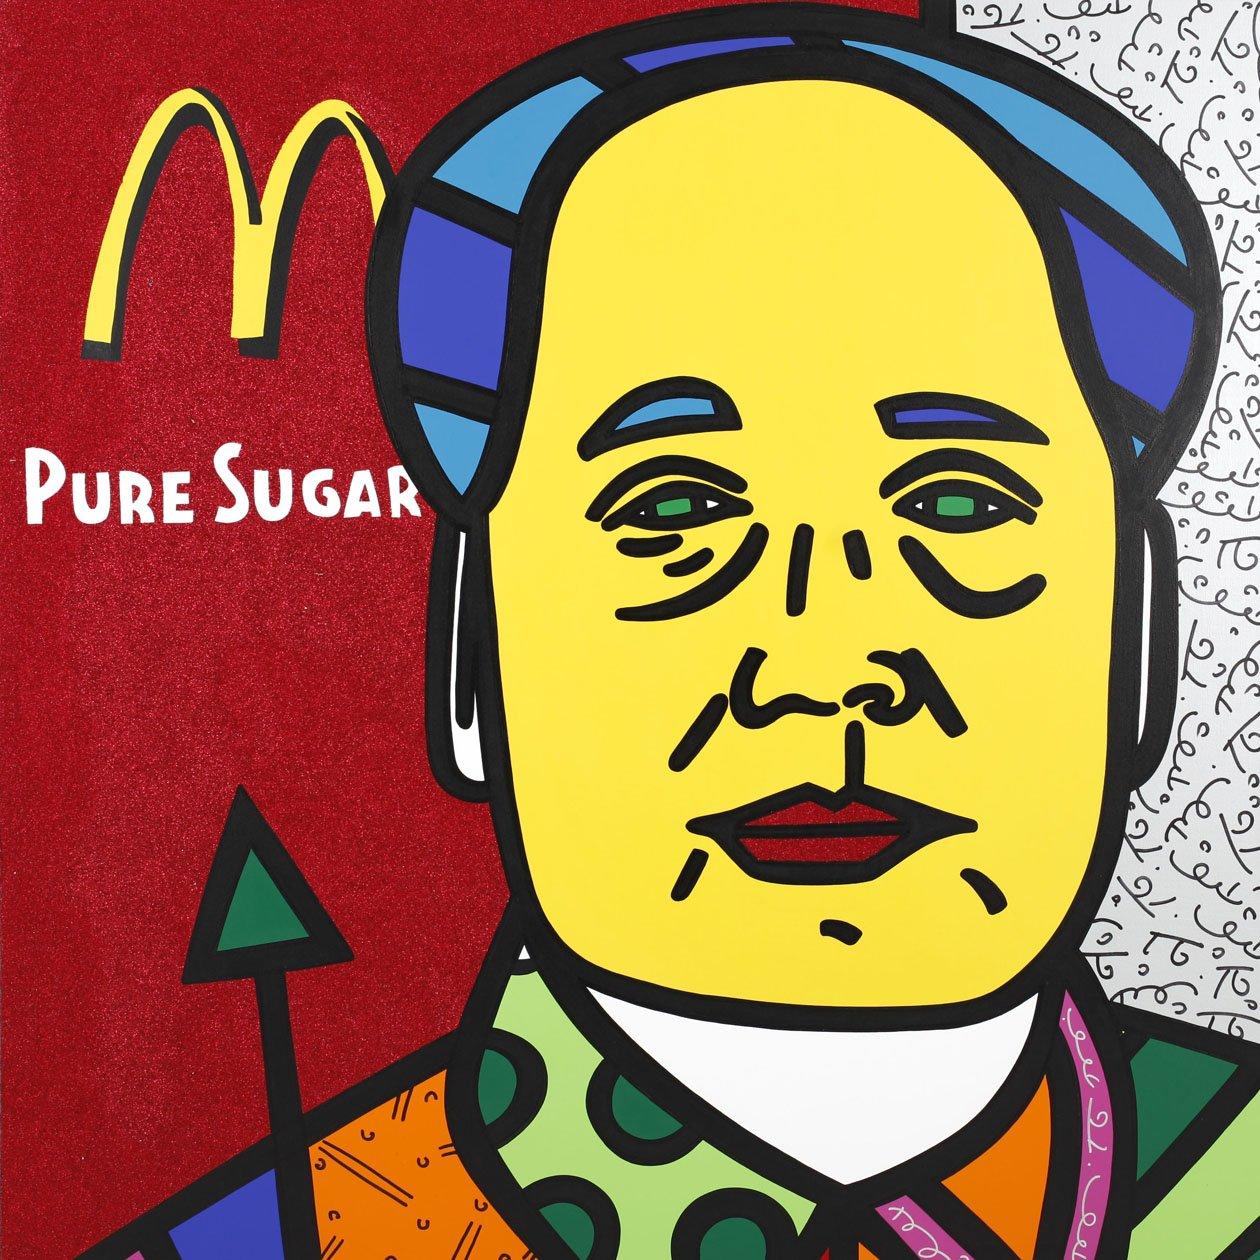 Photo Series: Mao in Pop Culture